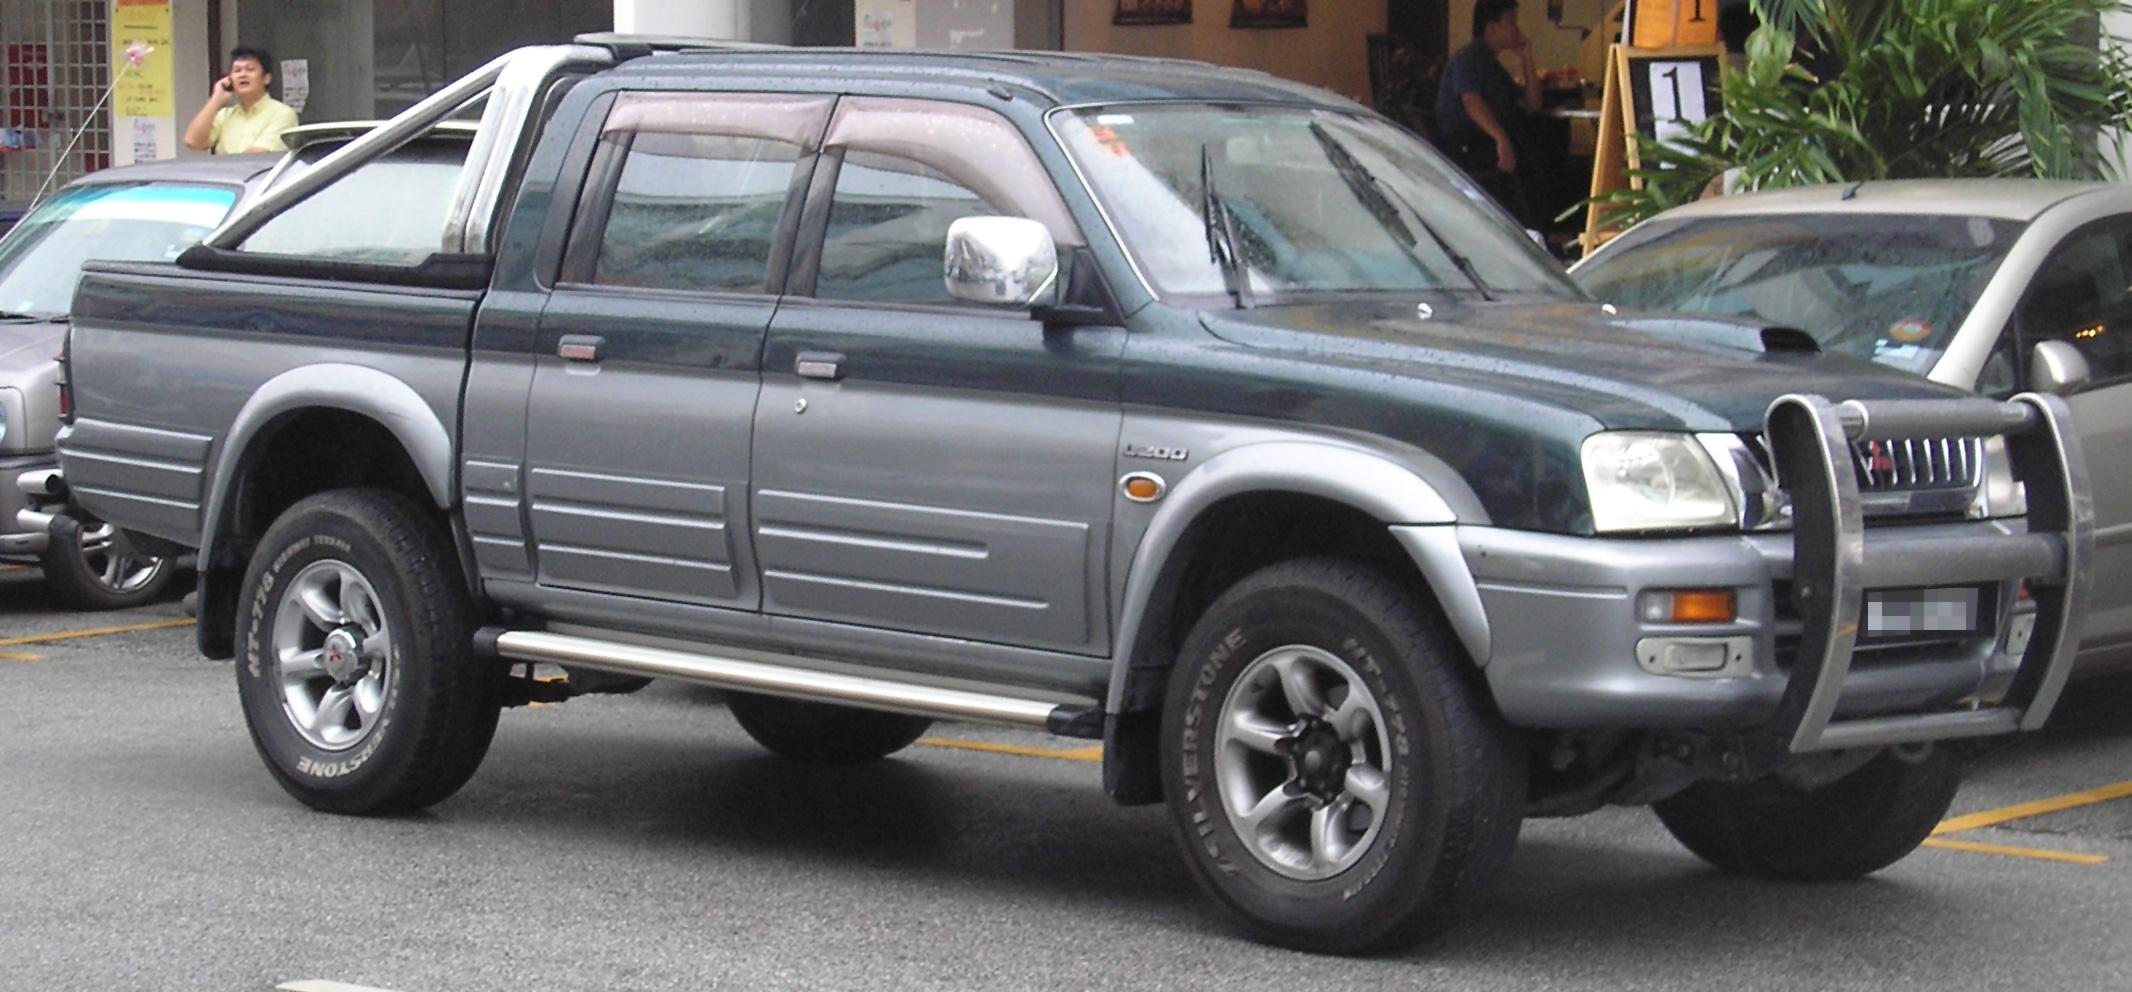 camioneta mitsubishi l200 2001: